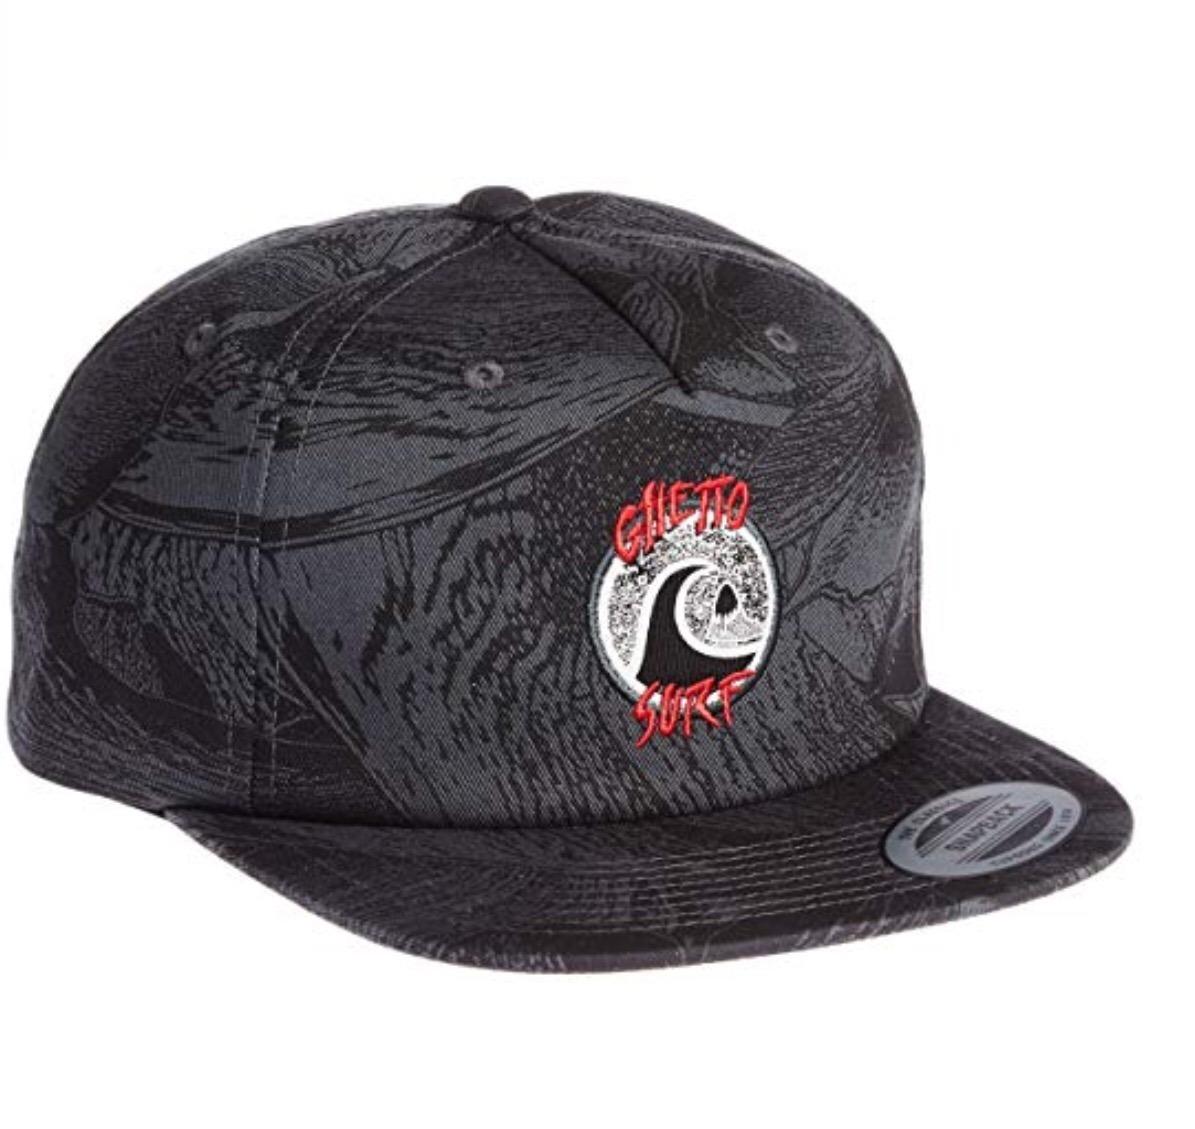 ... closeout gorra snapback quiksilver ghetto surf 100 original hat cap. cargando  zoom. db132 07457 c1325be34cd